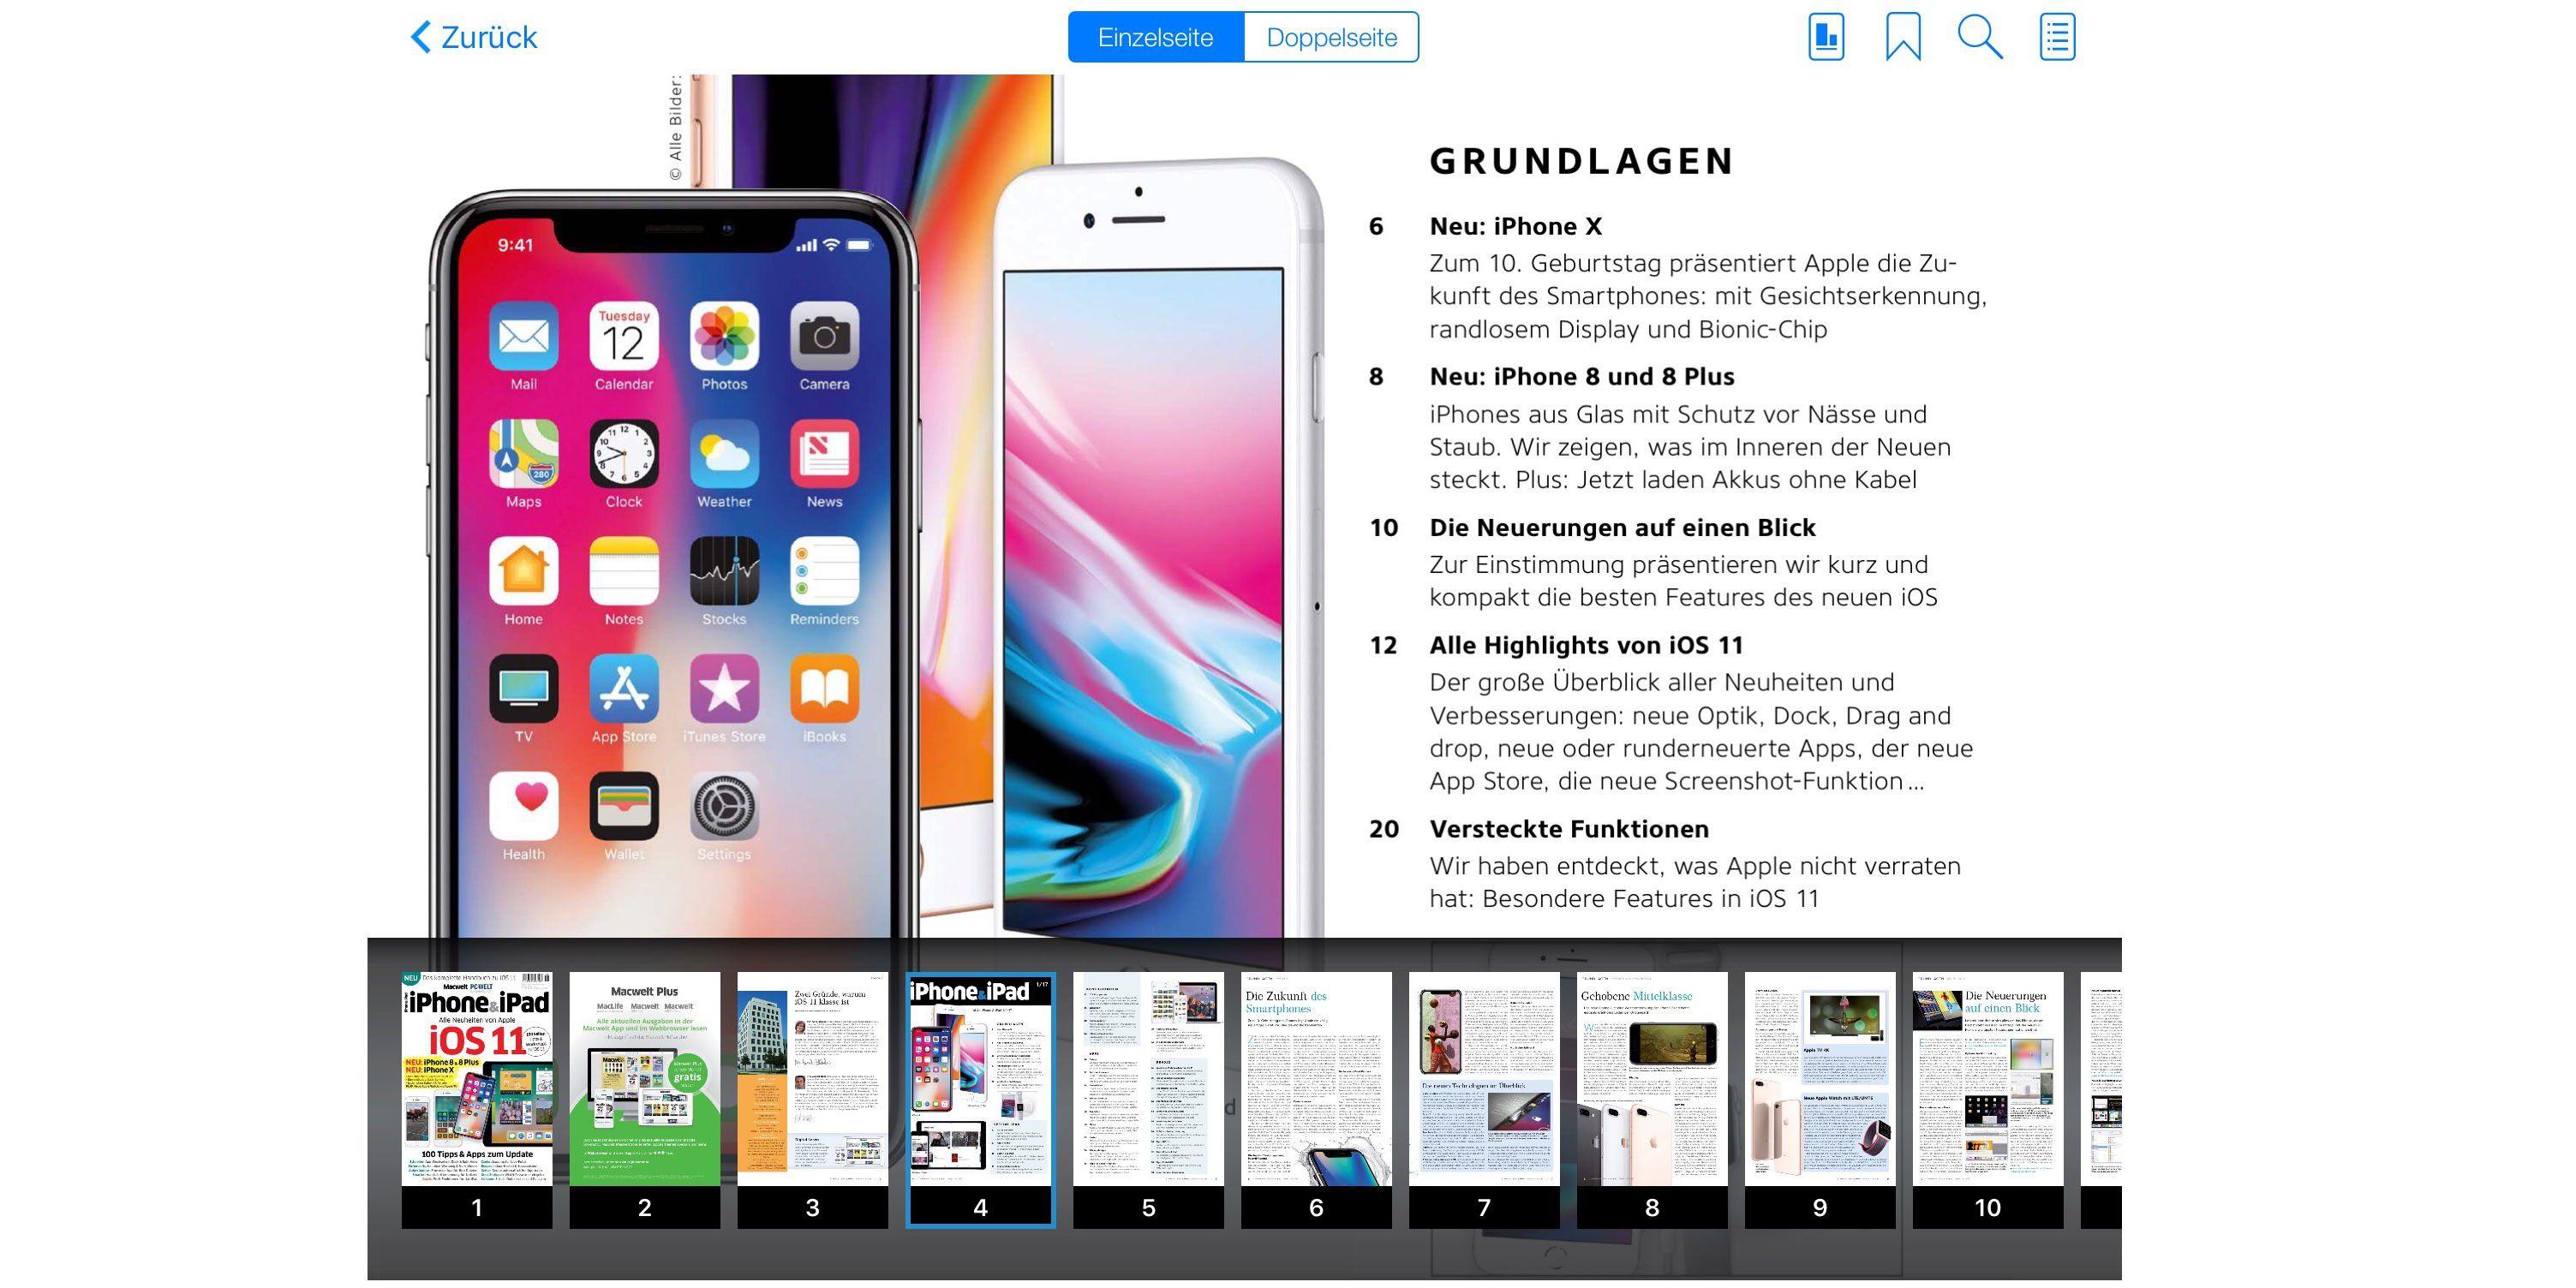 Geburtstag app fur iphone